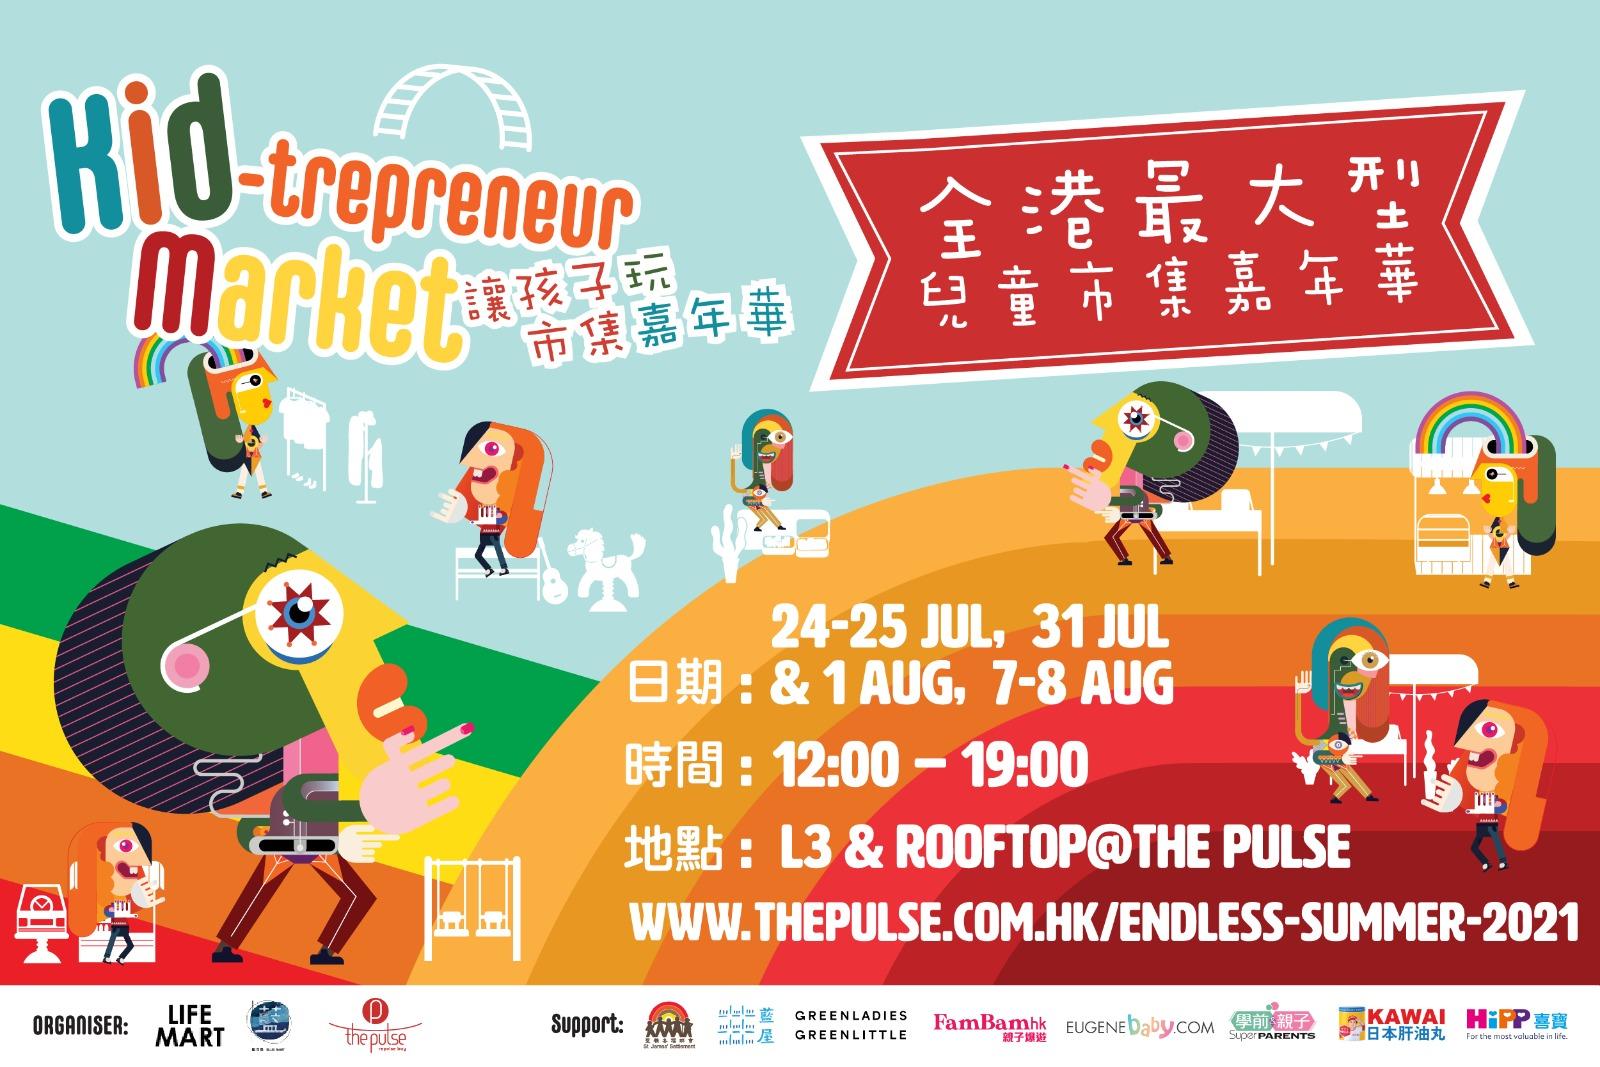 Hong Kongs biggest summer carnival – Kid-trepreneur market opening soon